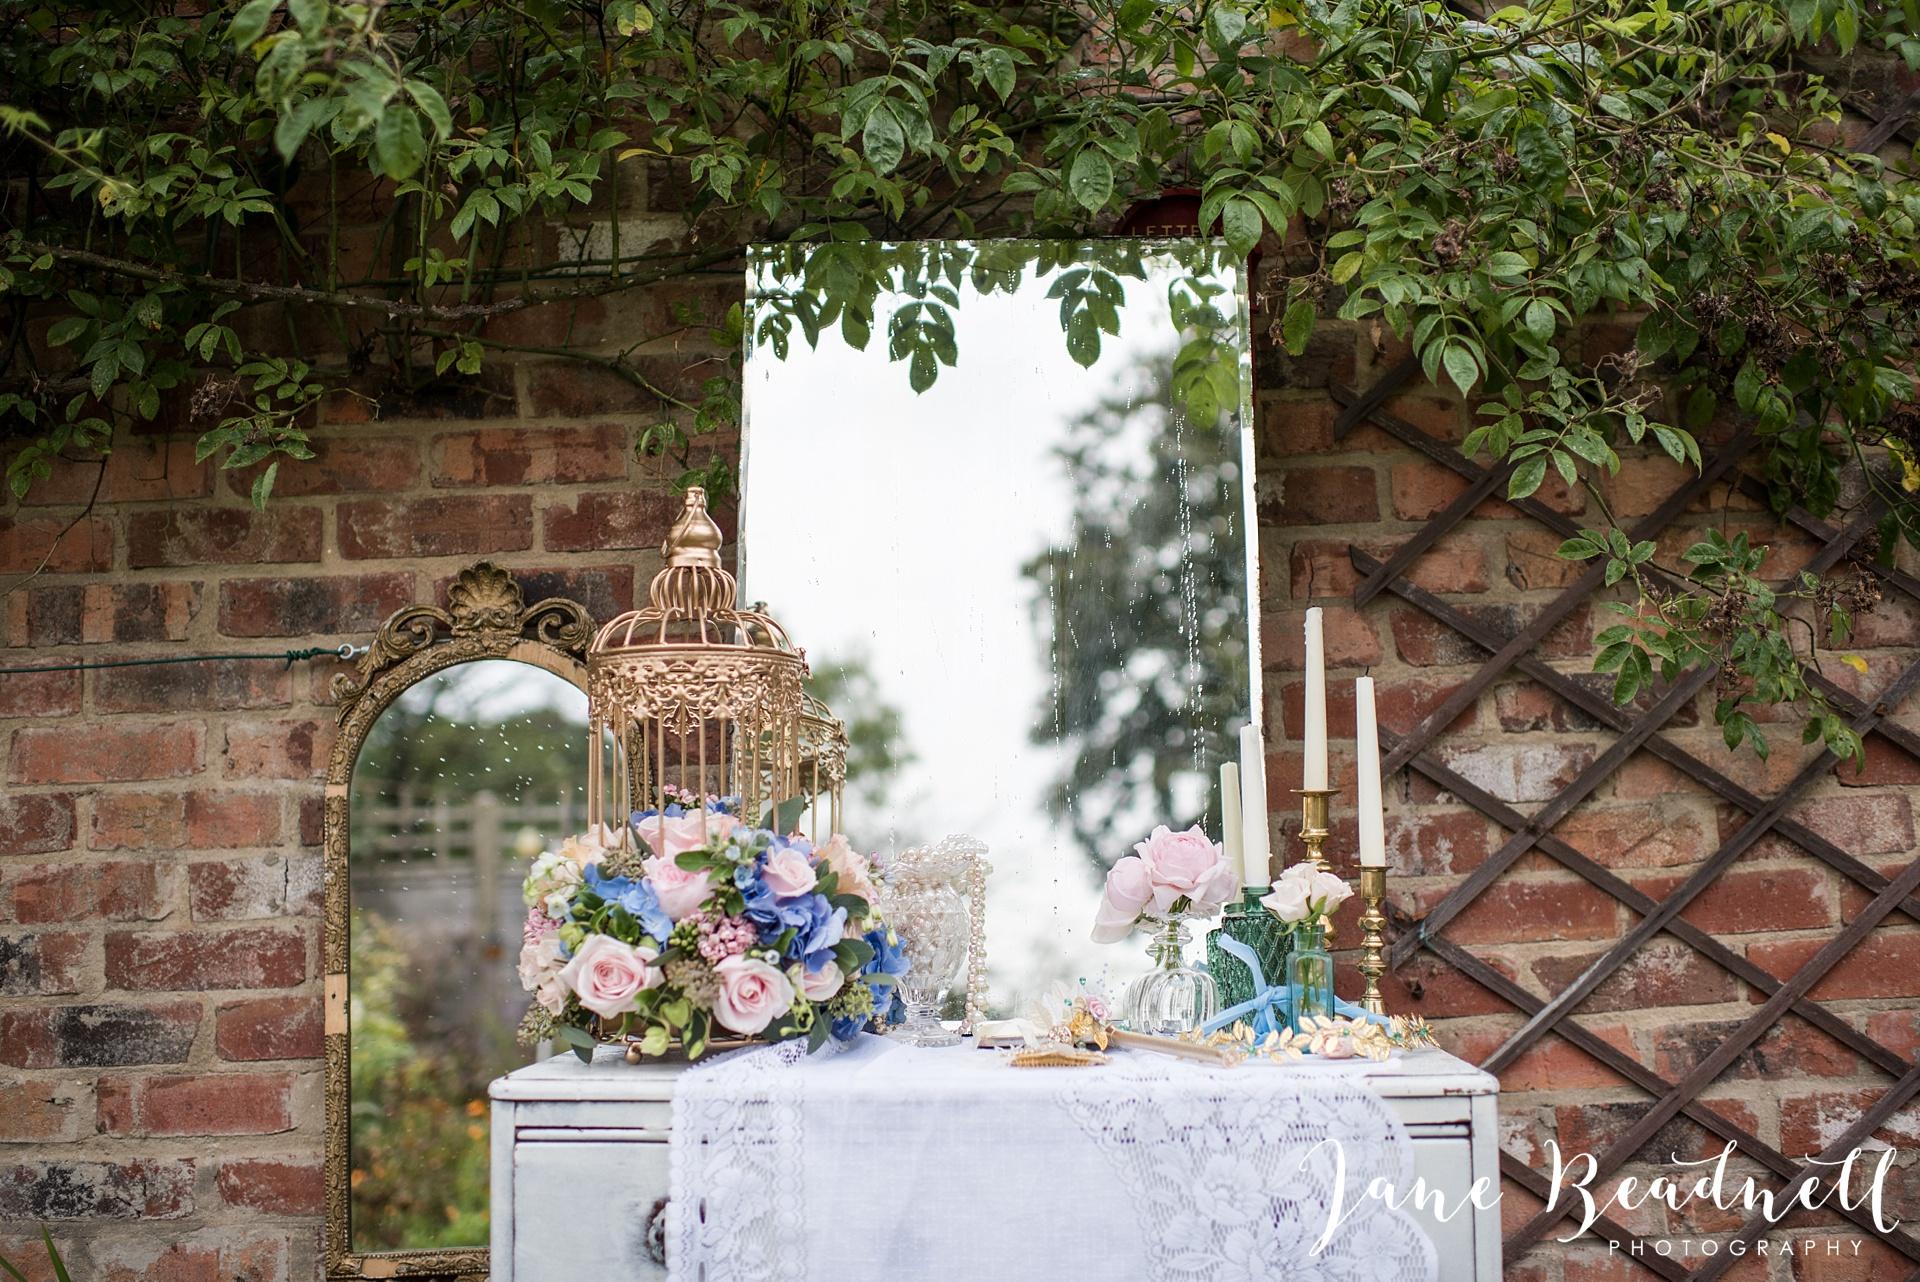 fine-art-wedding-photographer-jane-beadnell-photography-yorkshire-wedding-photographer_0004